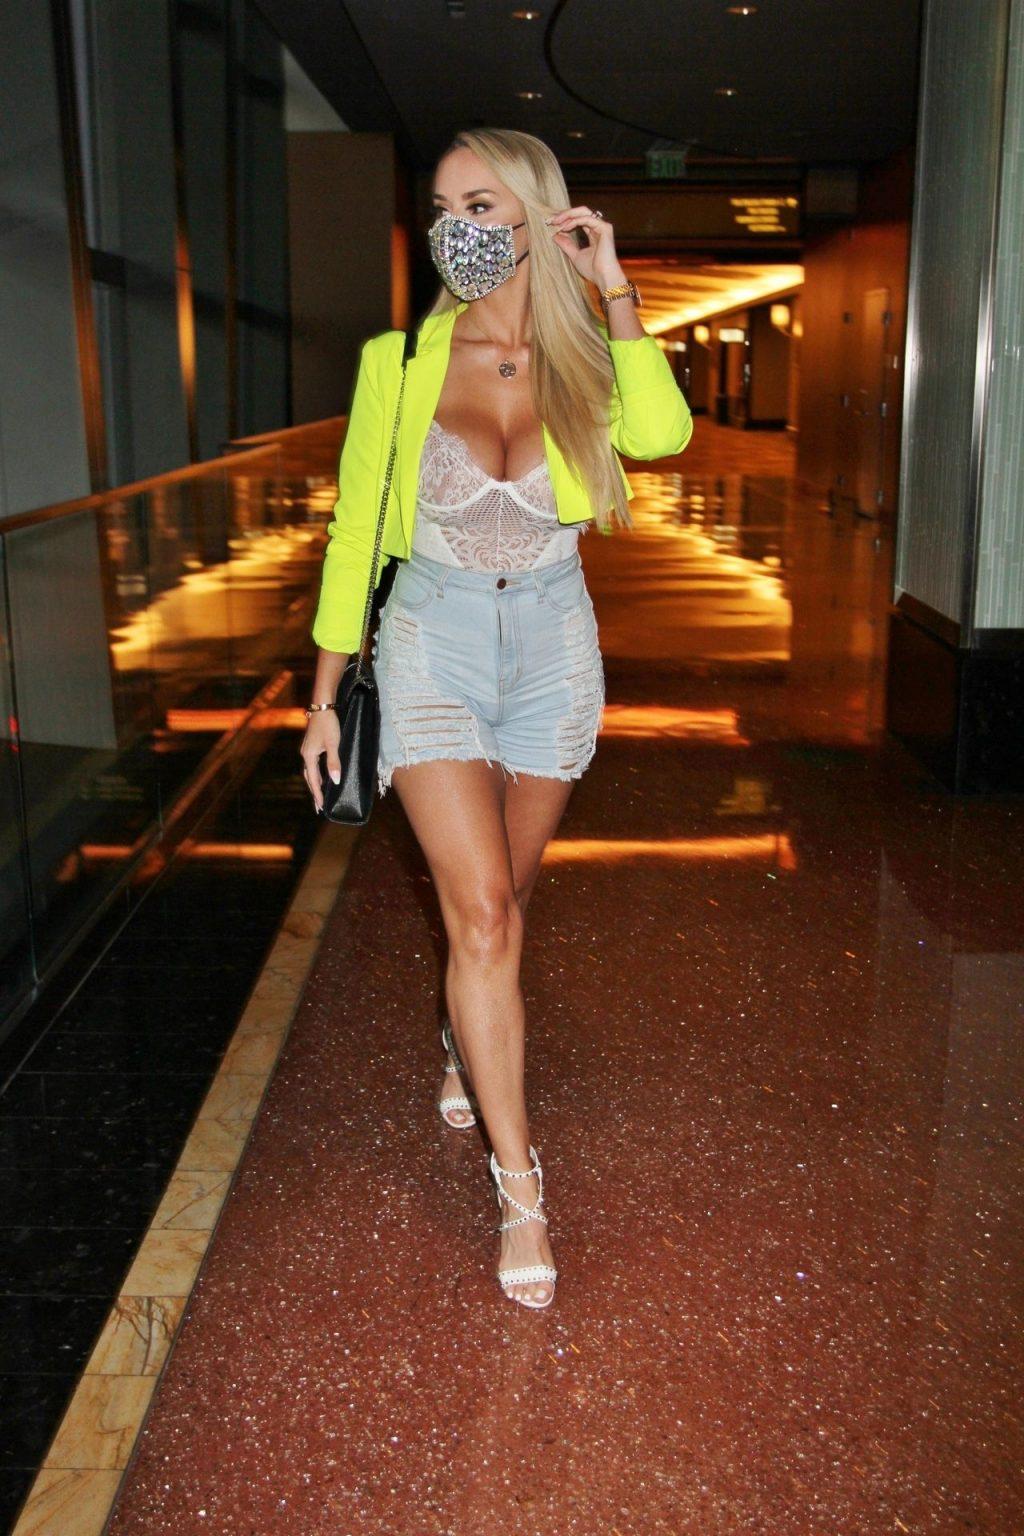 Claudia Fijal Puts on a Busty Display in Las Vegas (9 Sexy Photos)